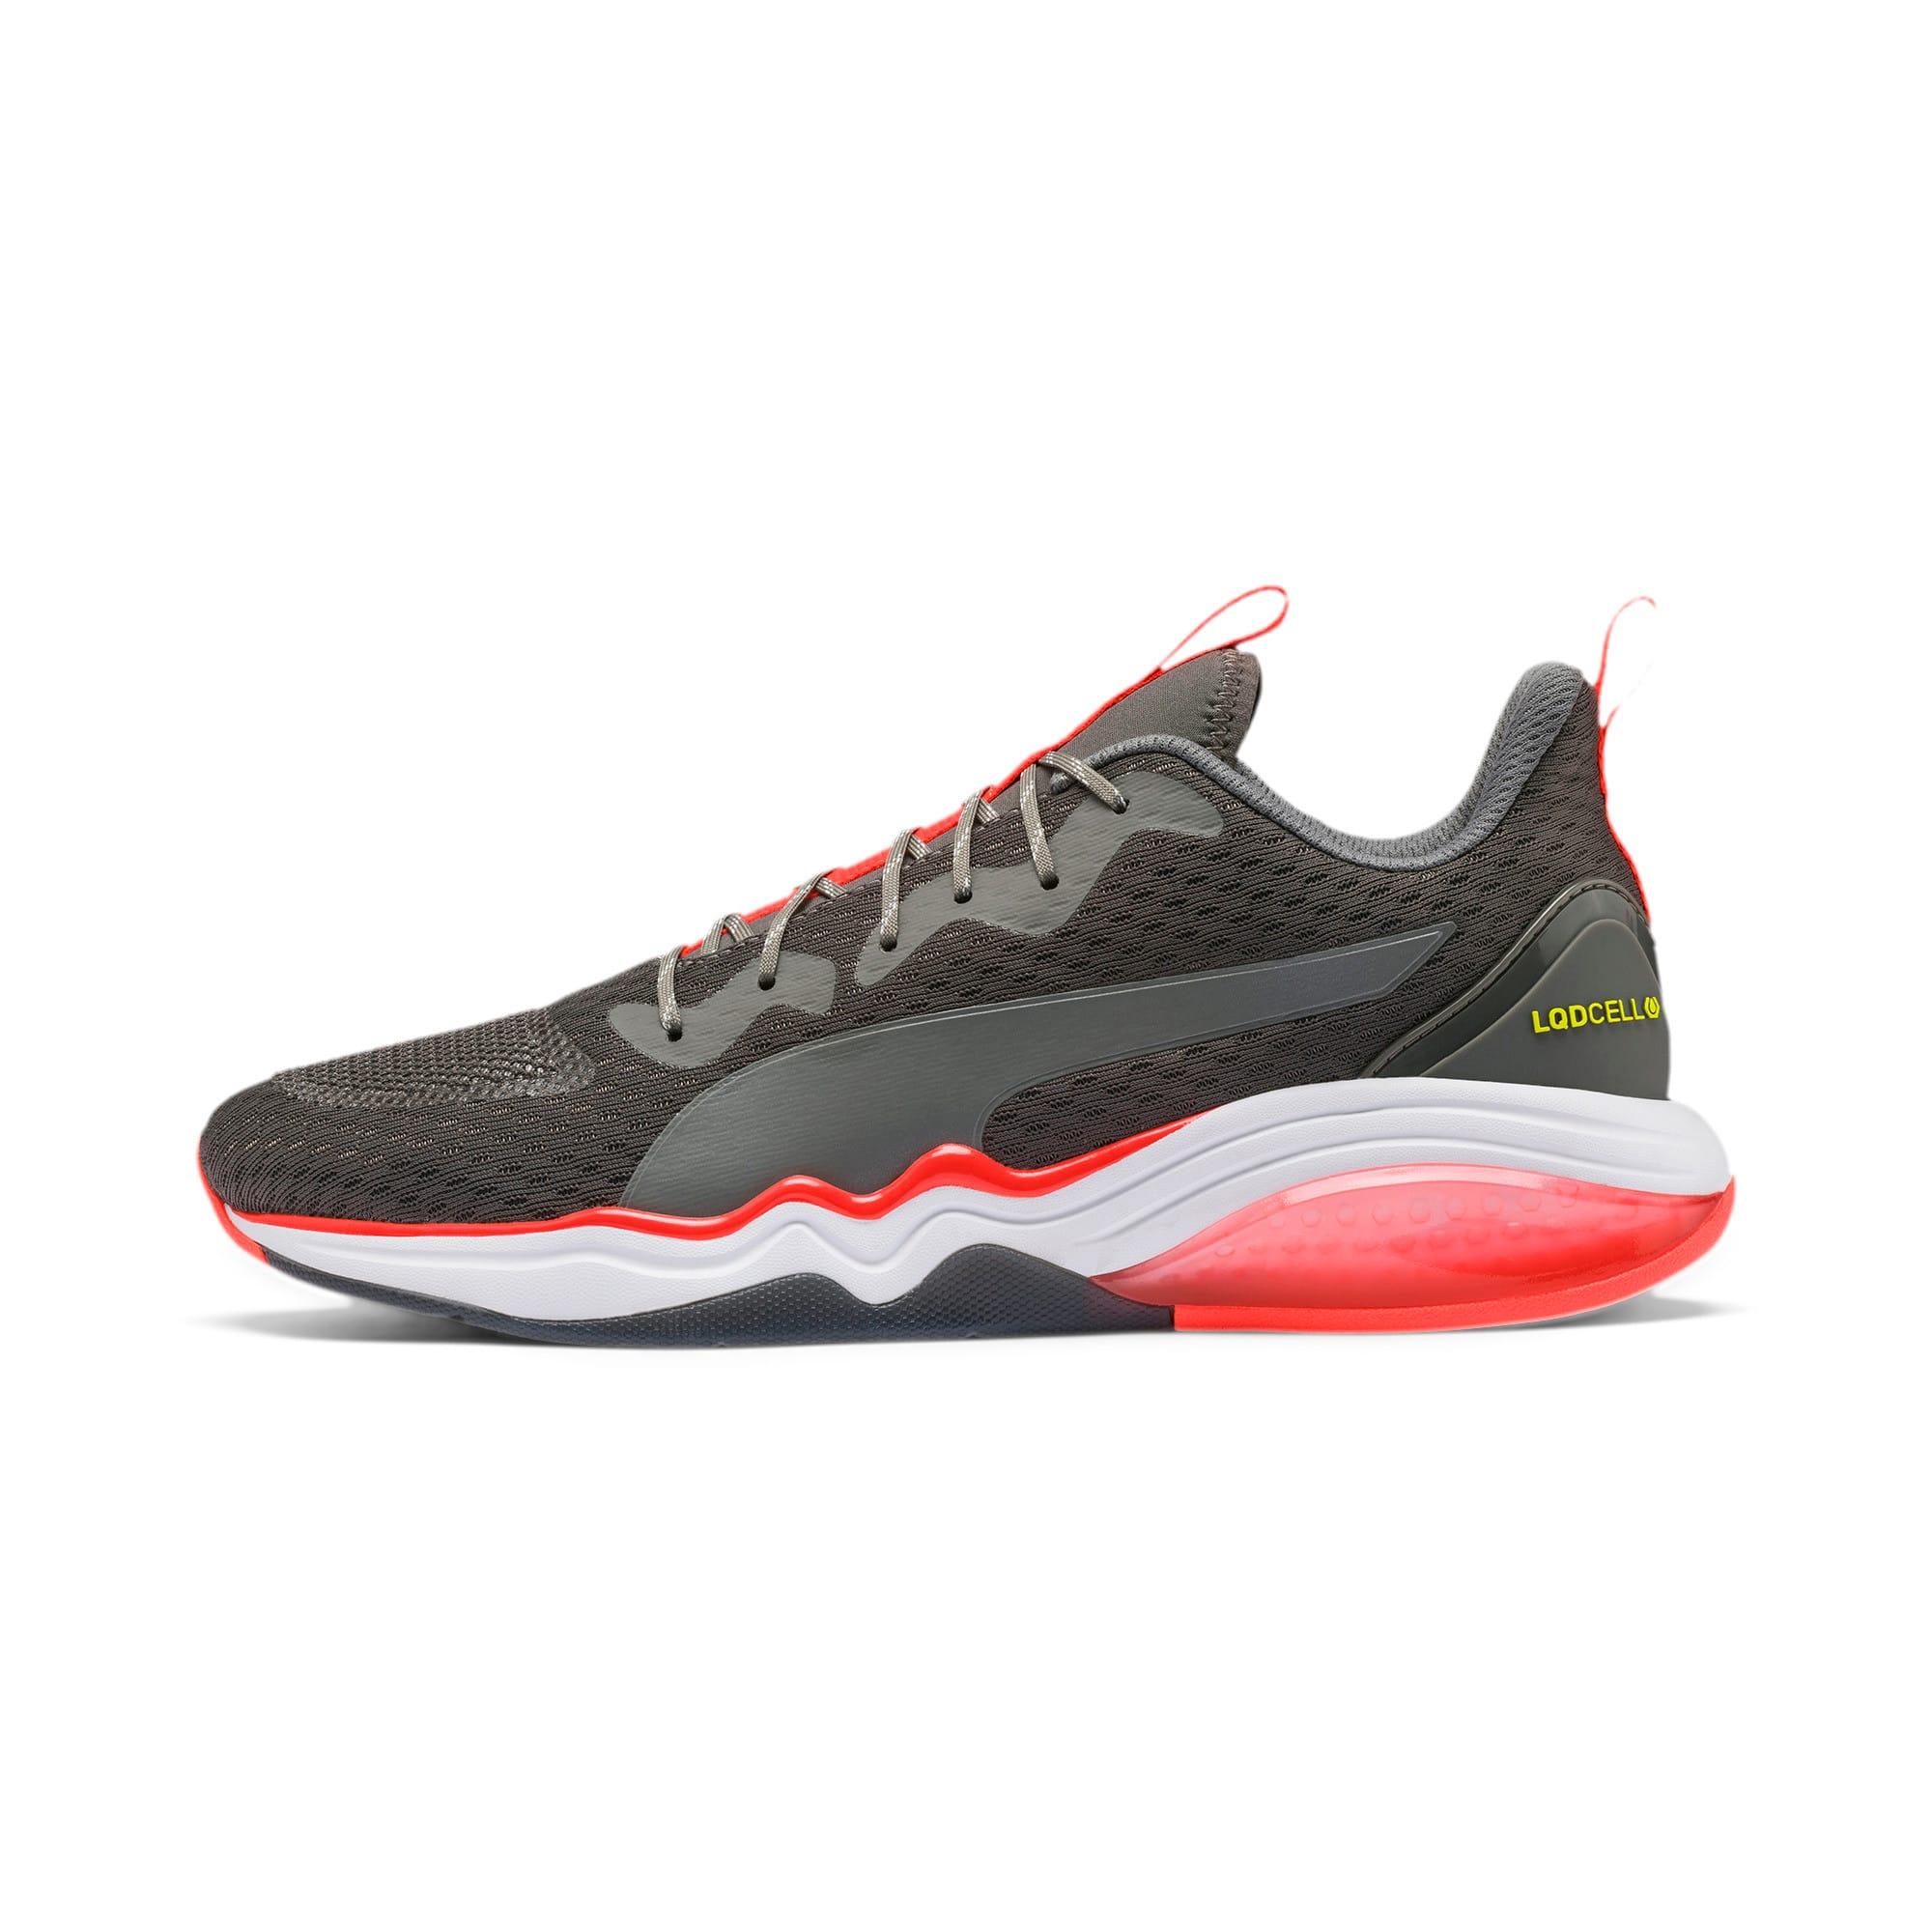 Thumbnail 1 of LQDCELL Tension Men's Training Shoes, CASTLEROCK-Nrgy Red-Y Alert, medium